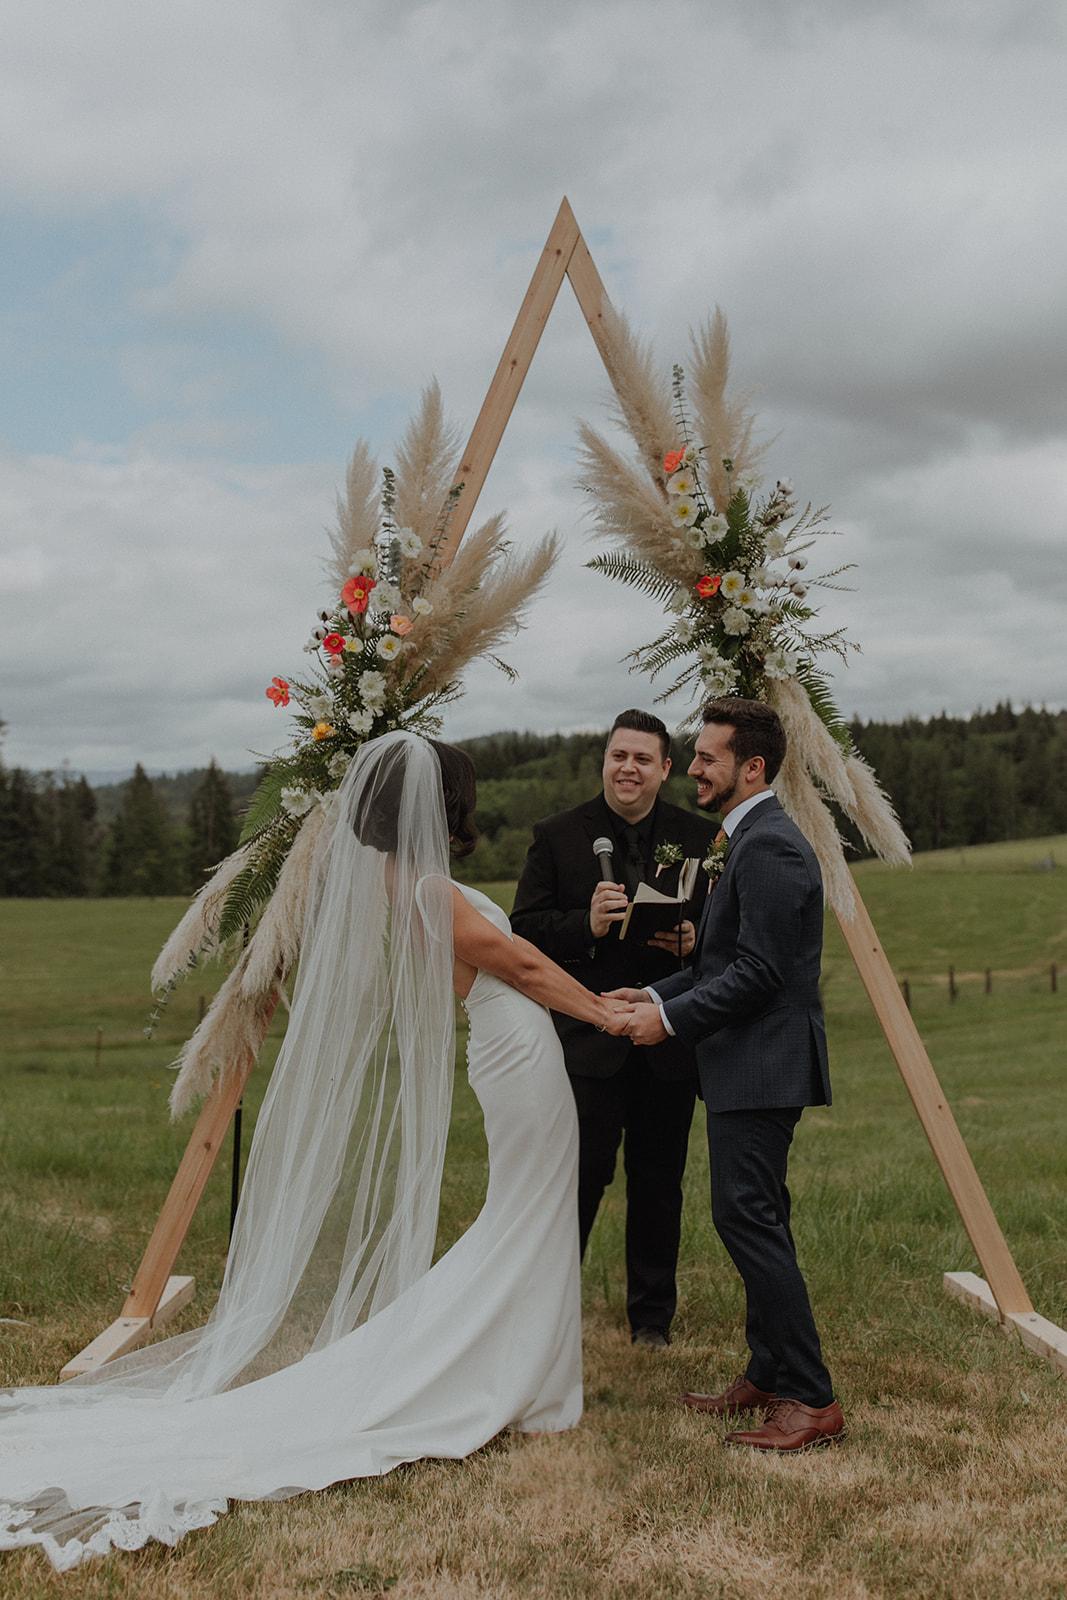 cortney_skye_wedding_june2019-410.jpg